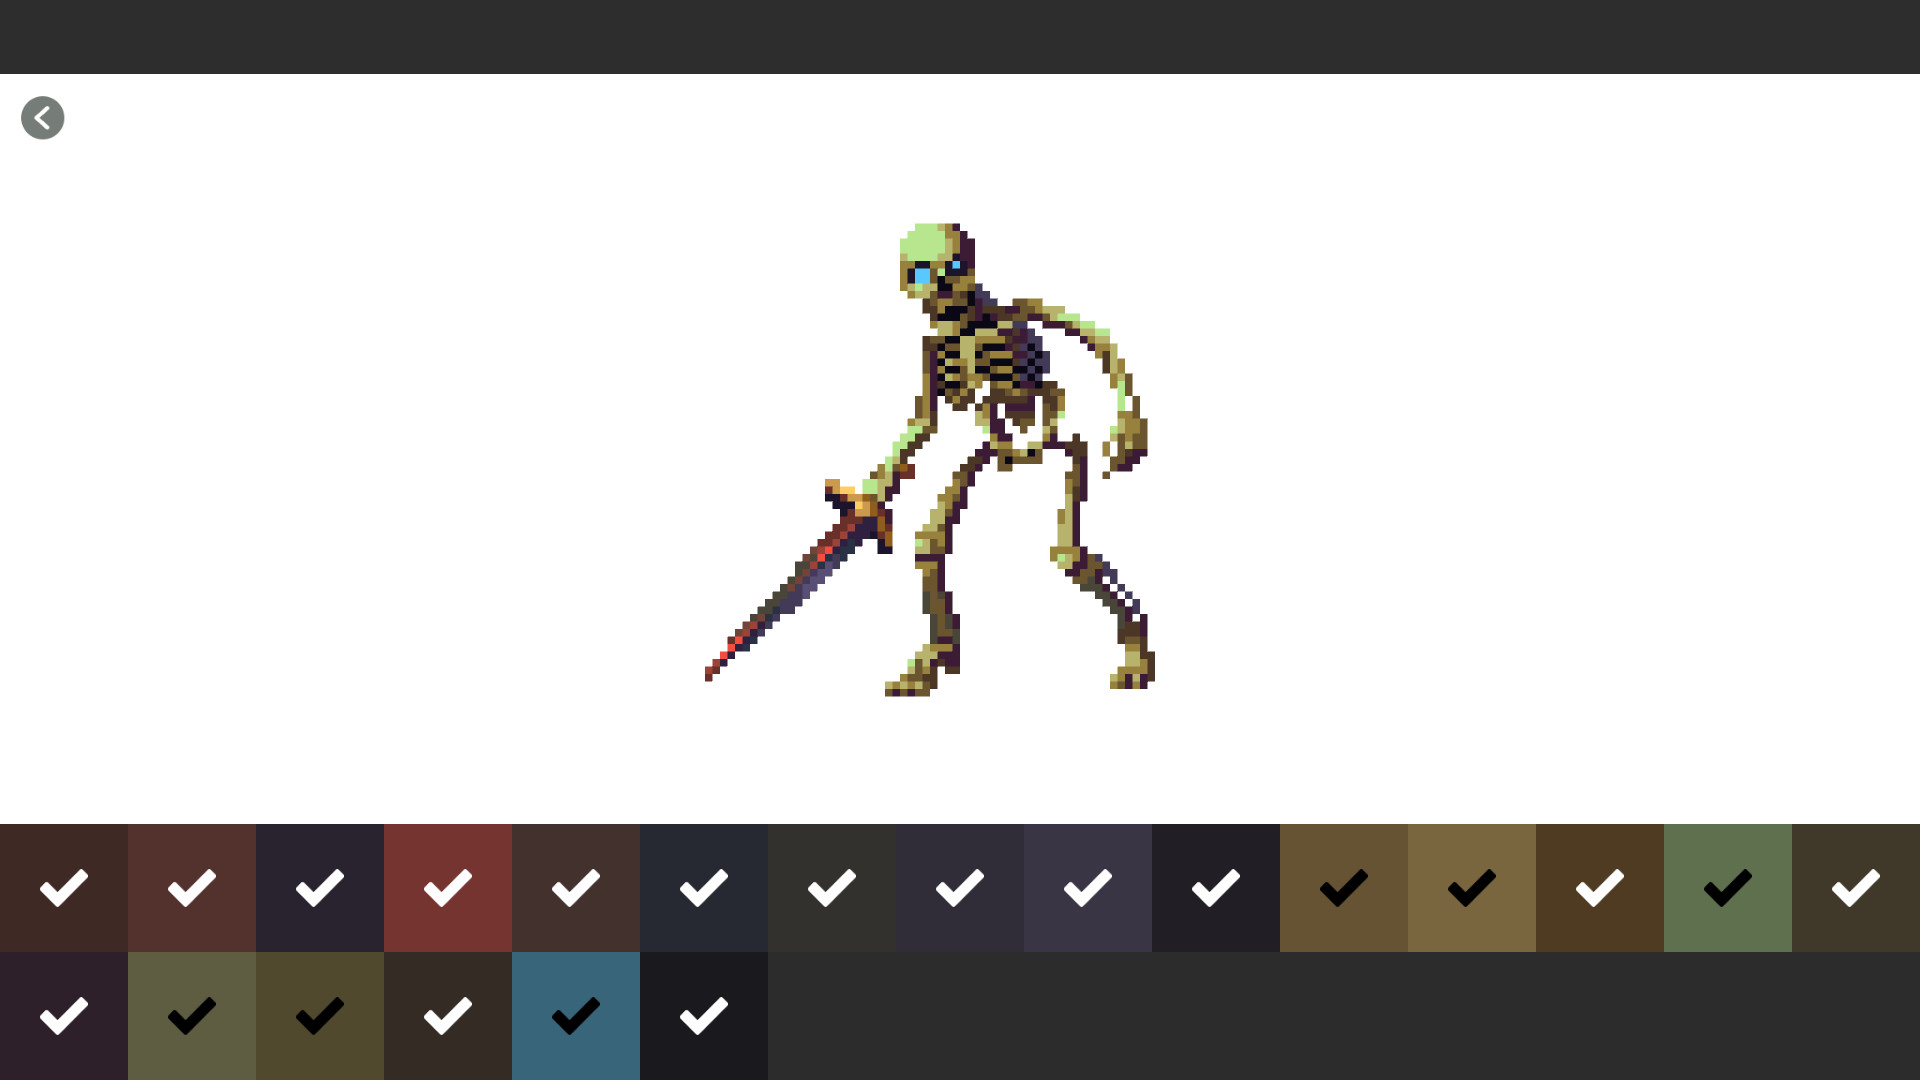 Pixel art monster color by number